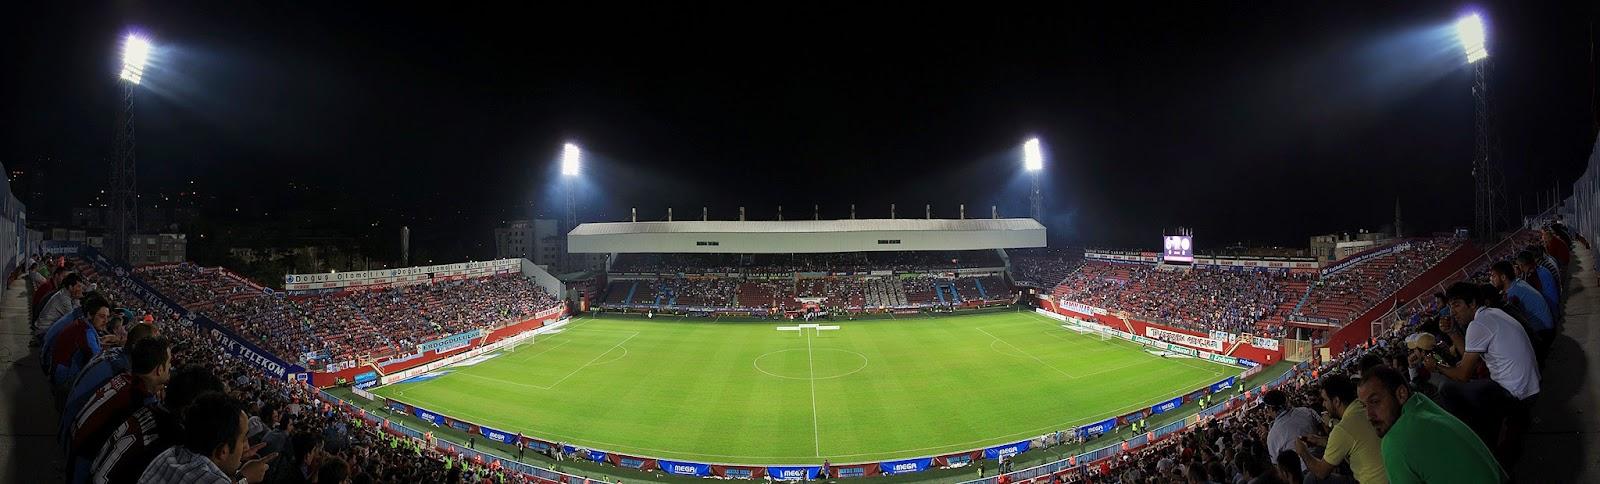 Hüseyin Avni Aker Stadium, Trabzonspor stadio